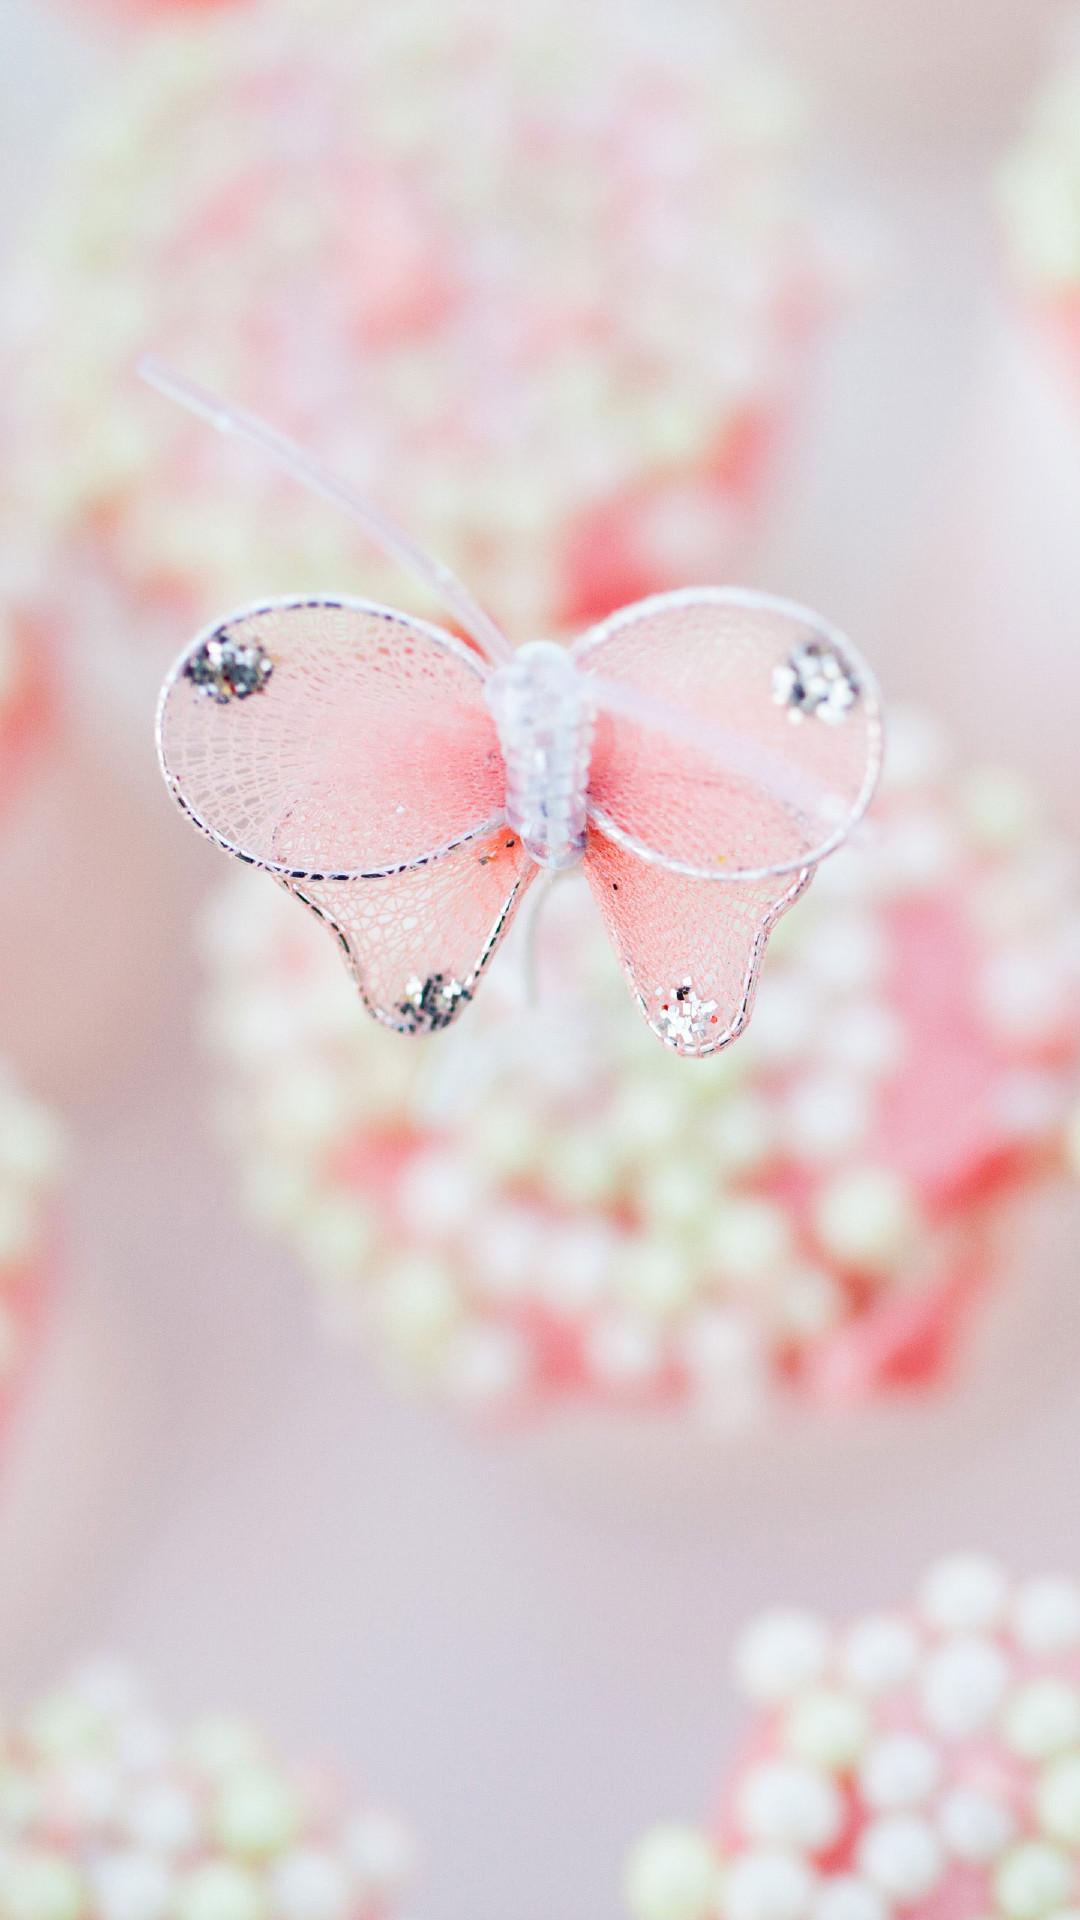 0 758 - Butterfly Hd Wallpaper Iphone , HD Wallpaper & Backgrounds